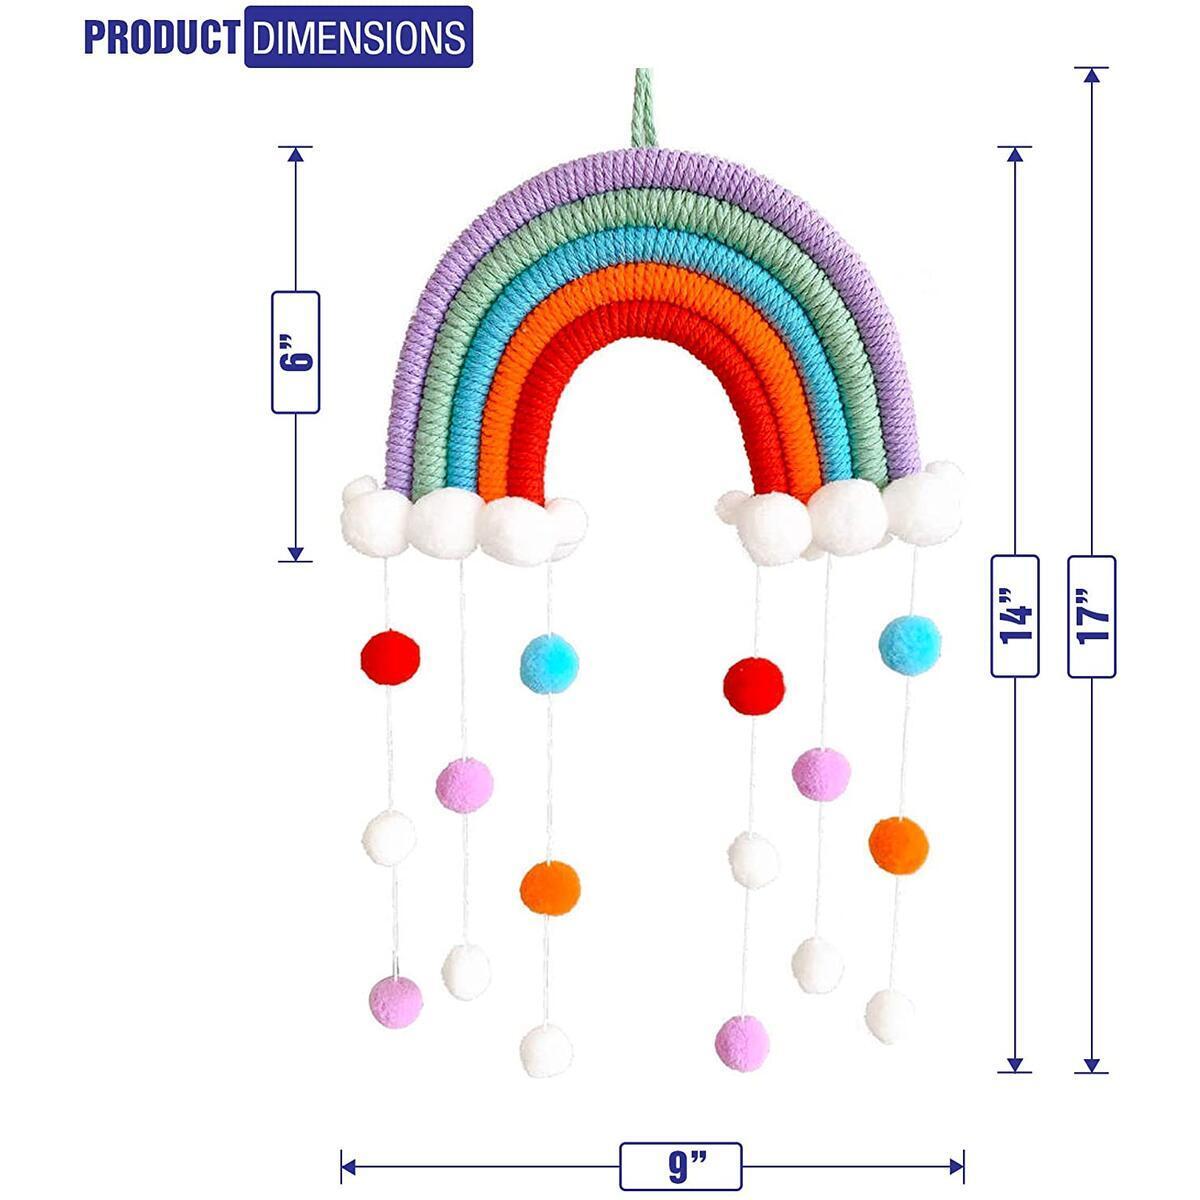 TheFamShop Macrame Rainbow Wall Hanging for Nursery, Dorm Room, Baby Shower, Classroom, Girls Room, Baby Room, Baby Shower, Birthday Party, Wedding, Boho Pom Pom Garland Home Décor